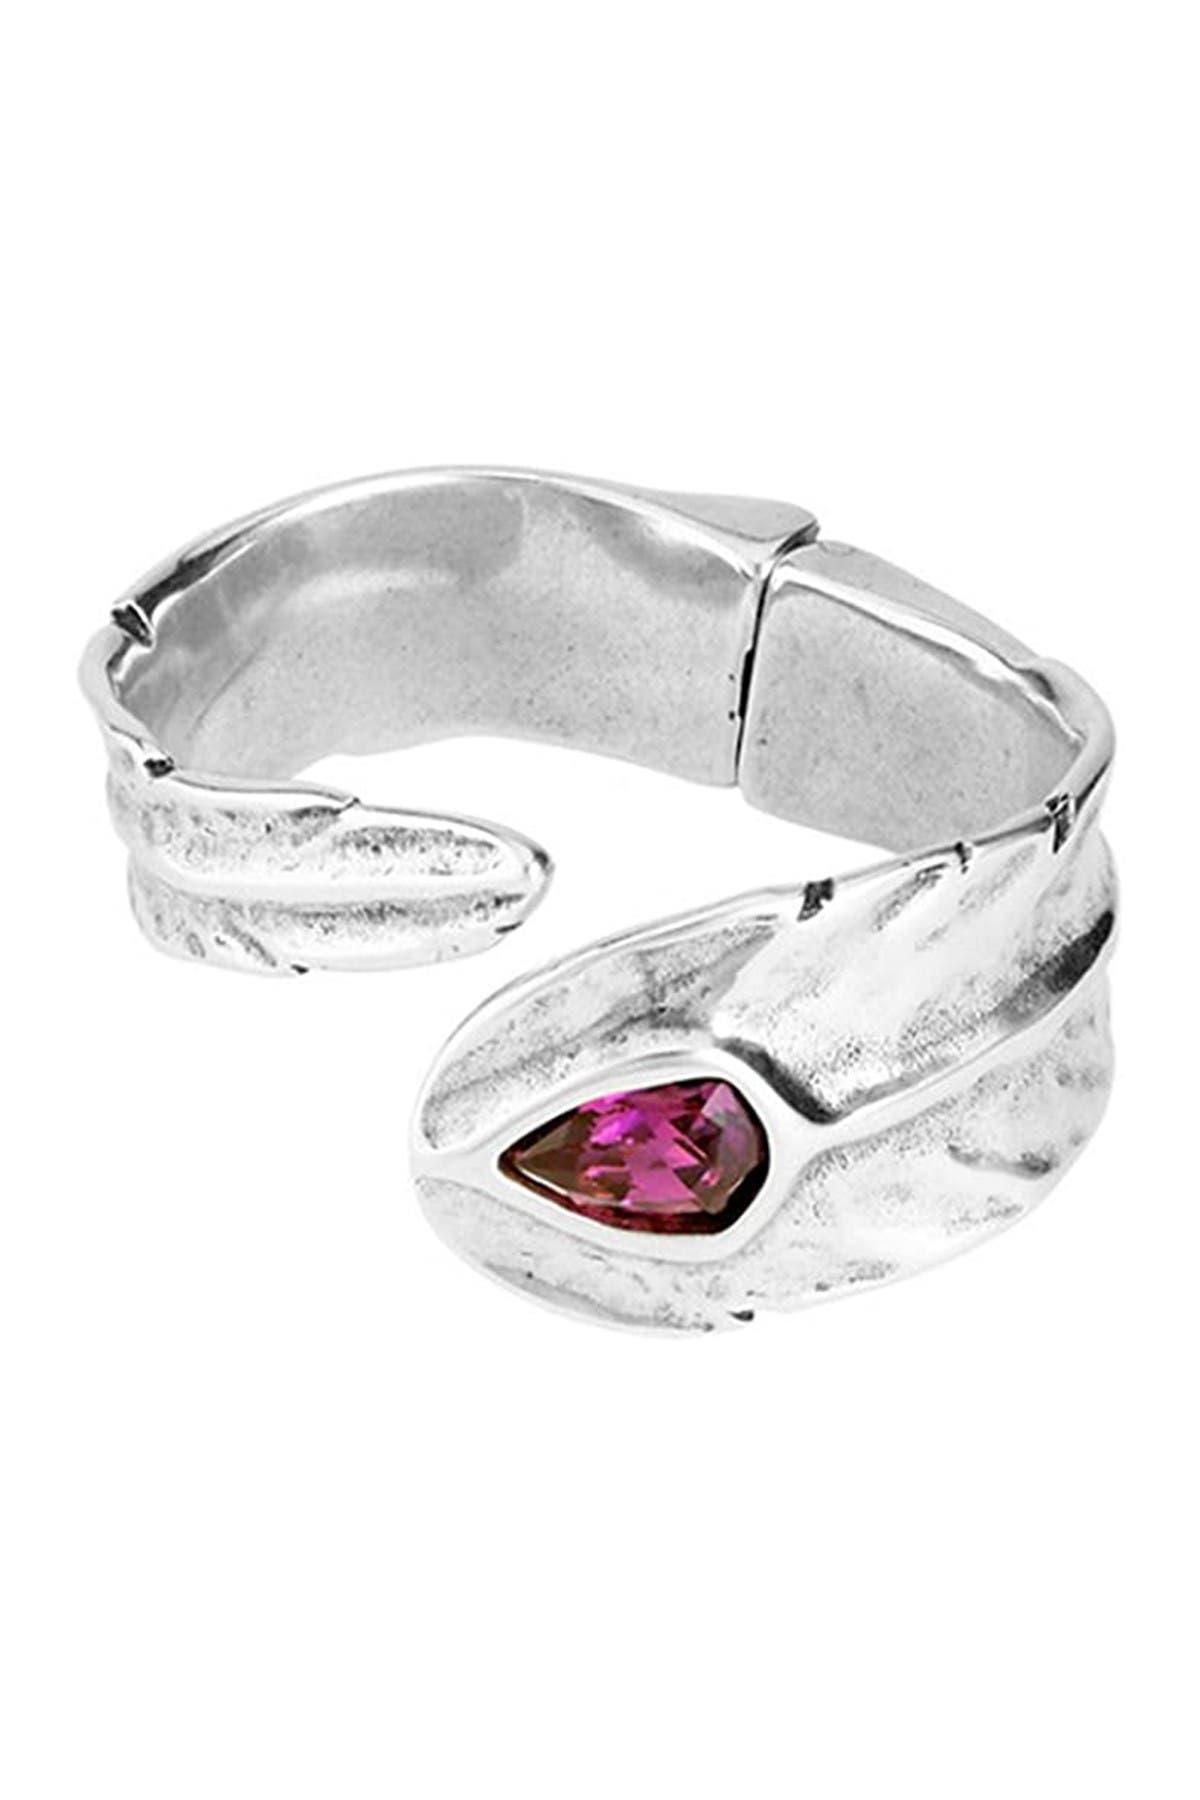 Image of Uno De 50 Mirame Swarovski Crystal Accented Hinged Cuff Bracelet